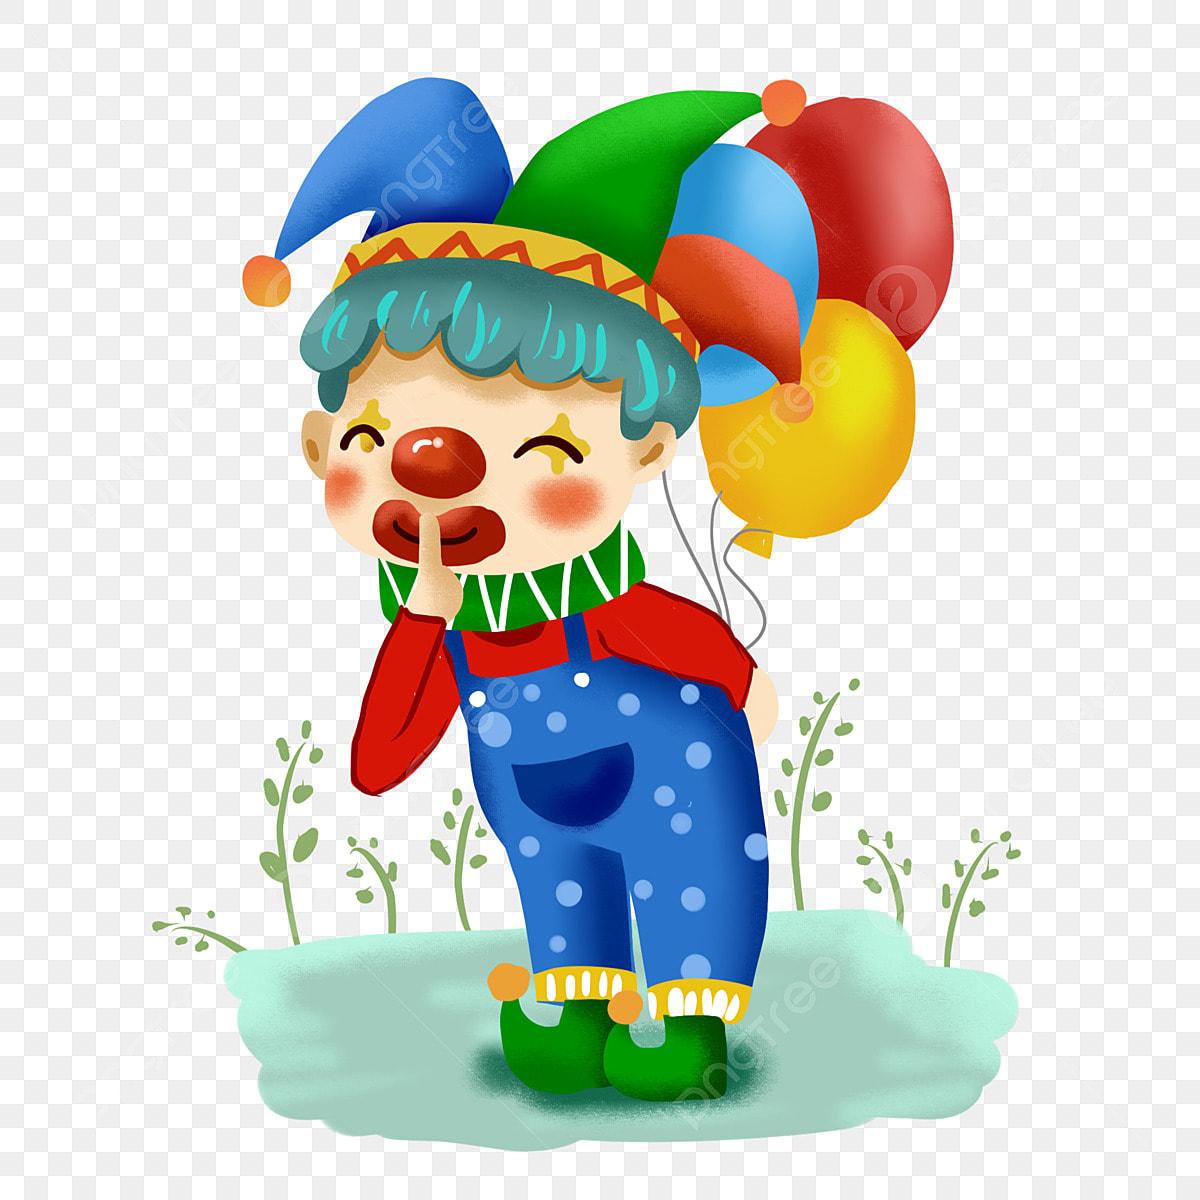 Cartoon Cute Clown Funny Naughty Holding Balloon Cartoon